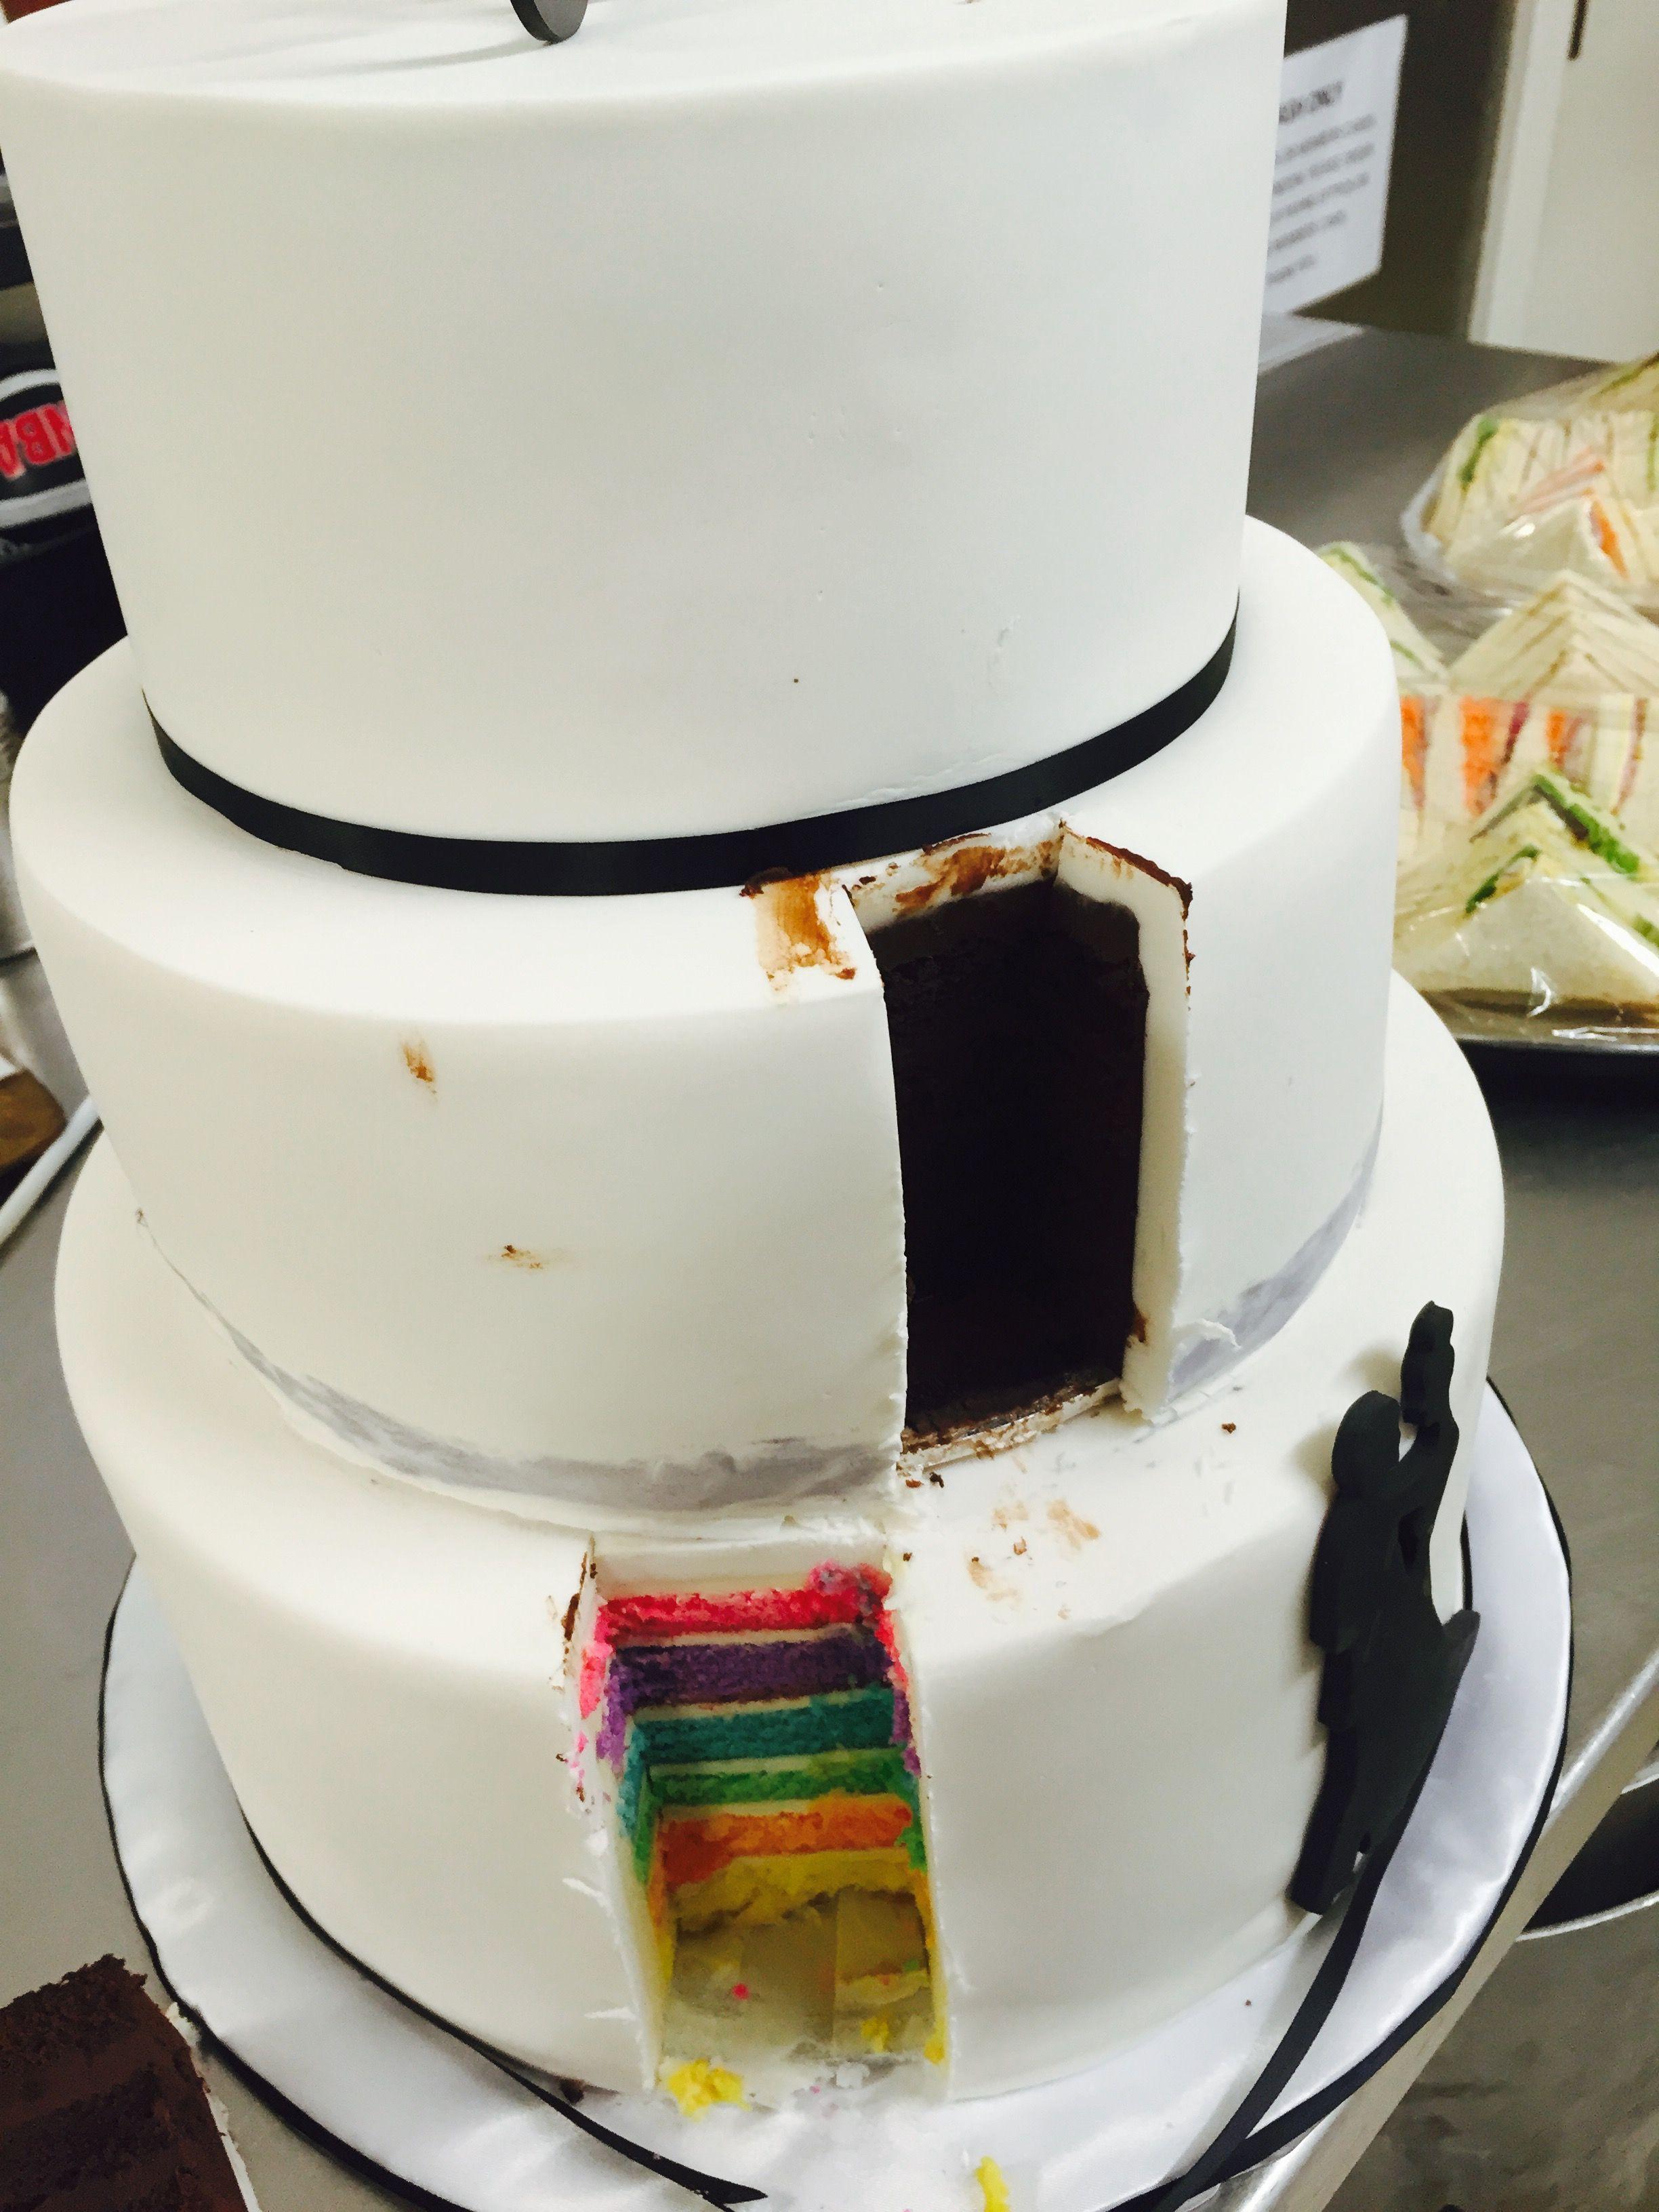 3 Tier Wedding Cake - inside peek at the layers. | Wedding Cakes ...